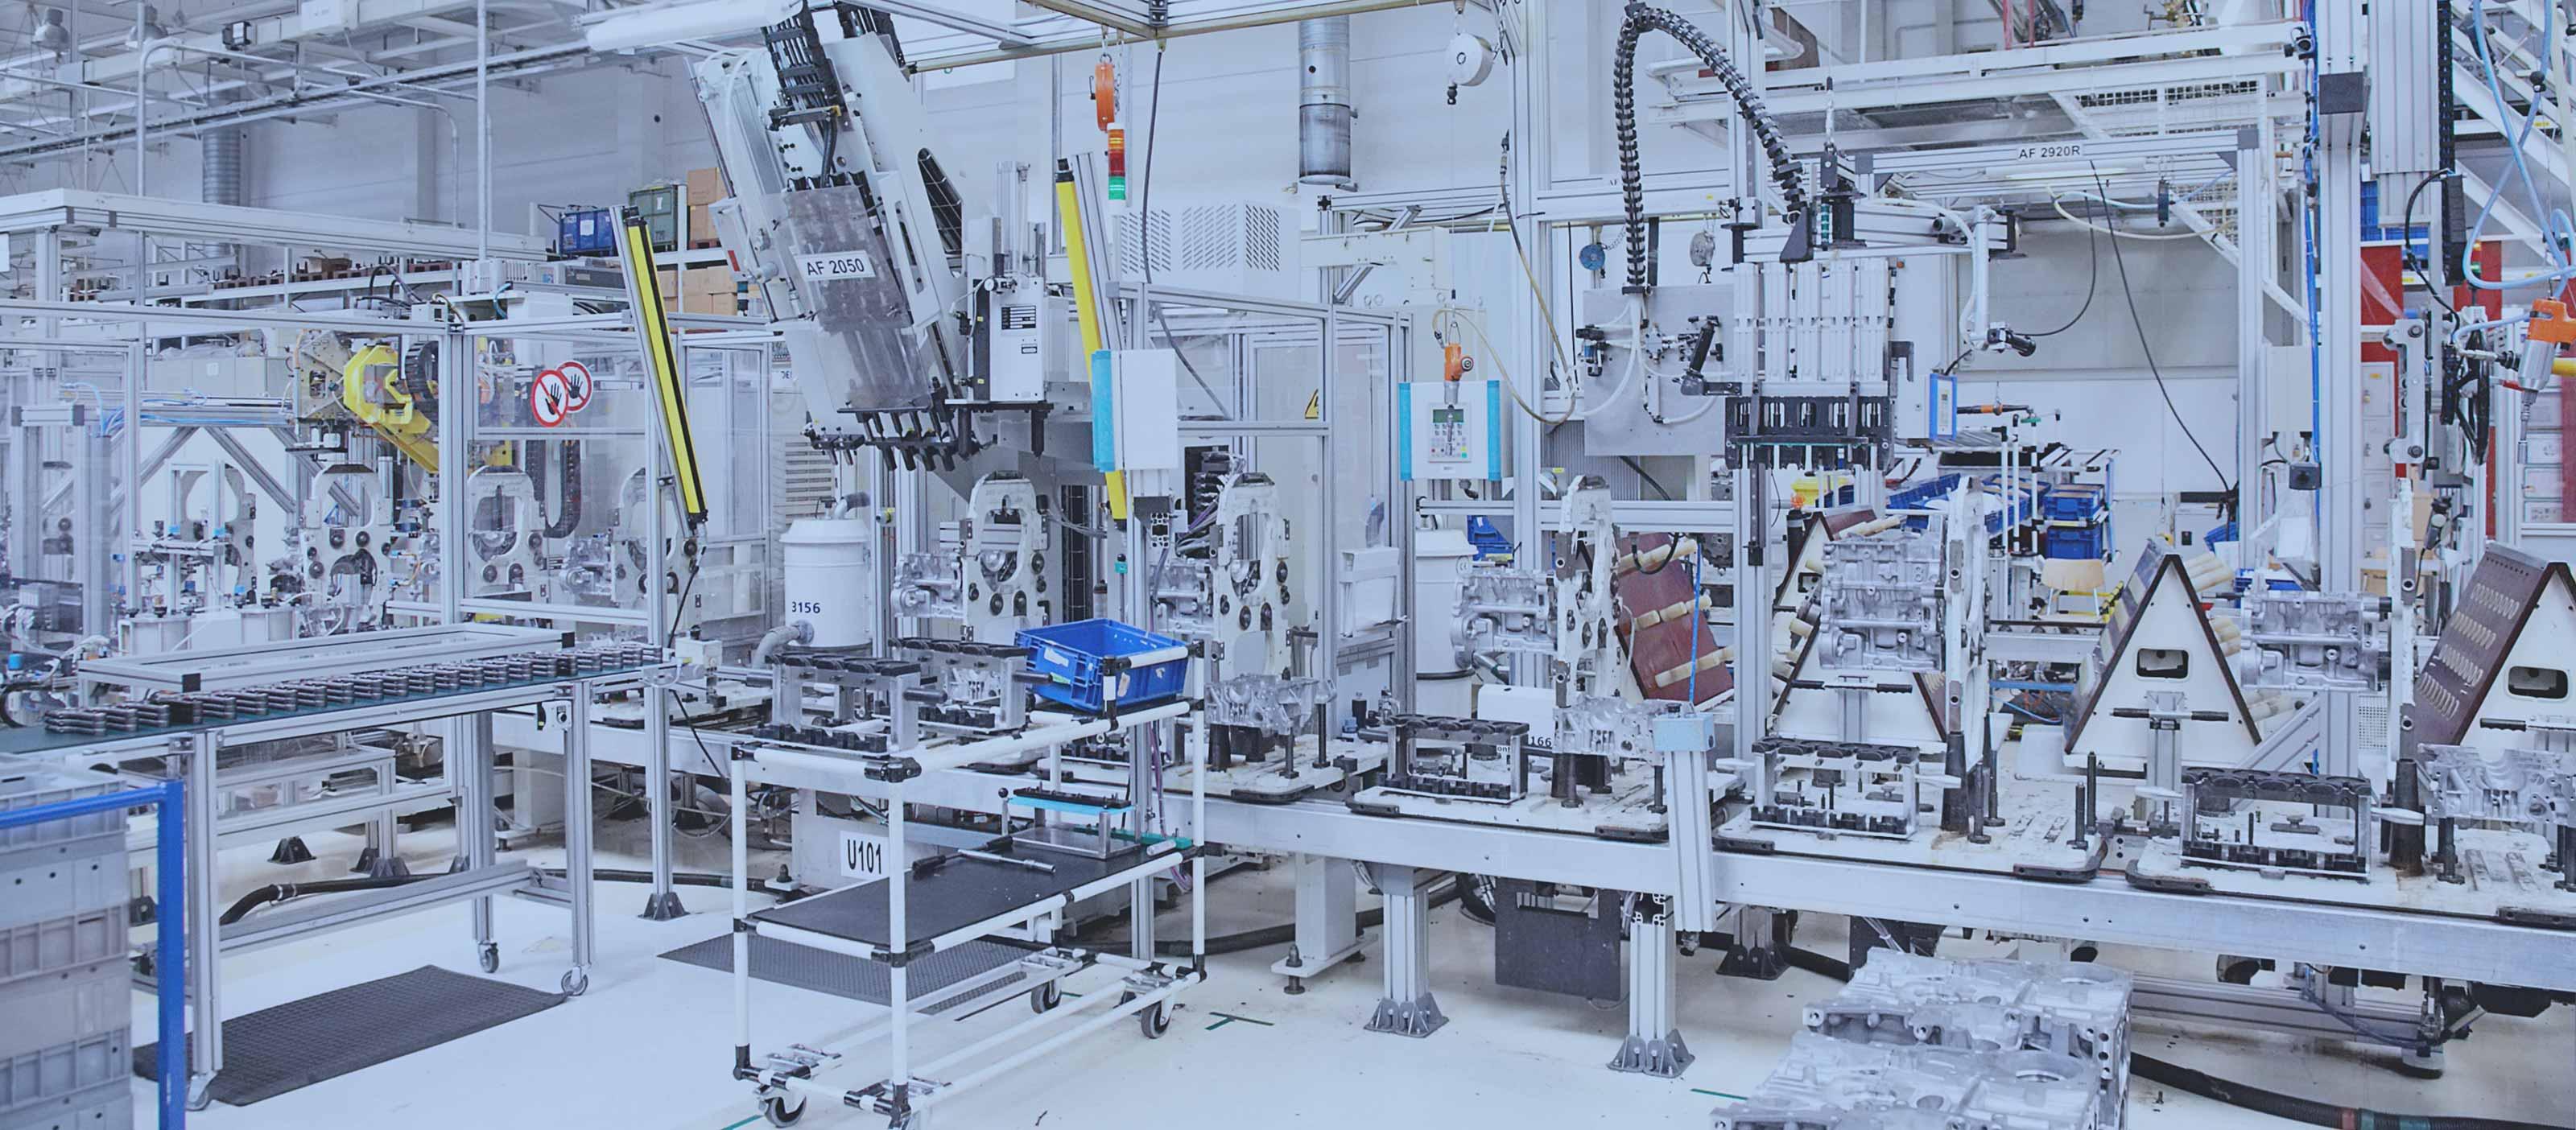 header-manufacturing-auto-engines-41033853-3200x1404-v3